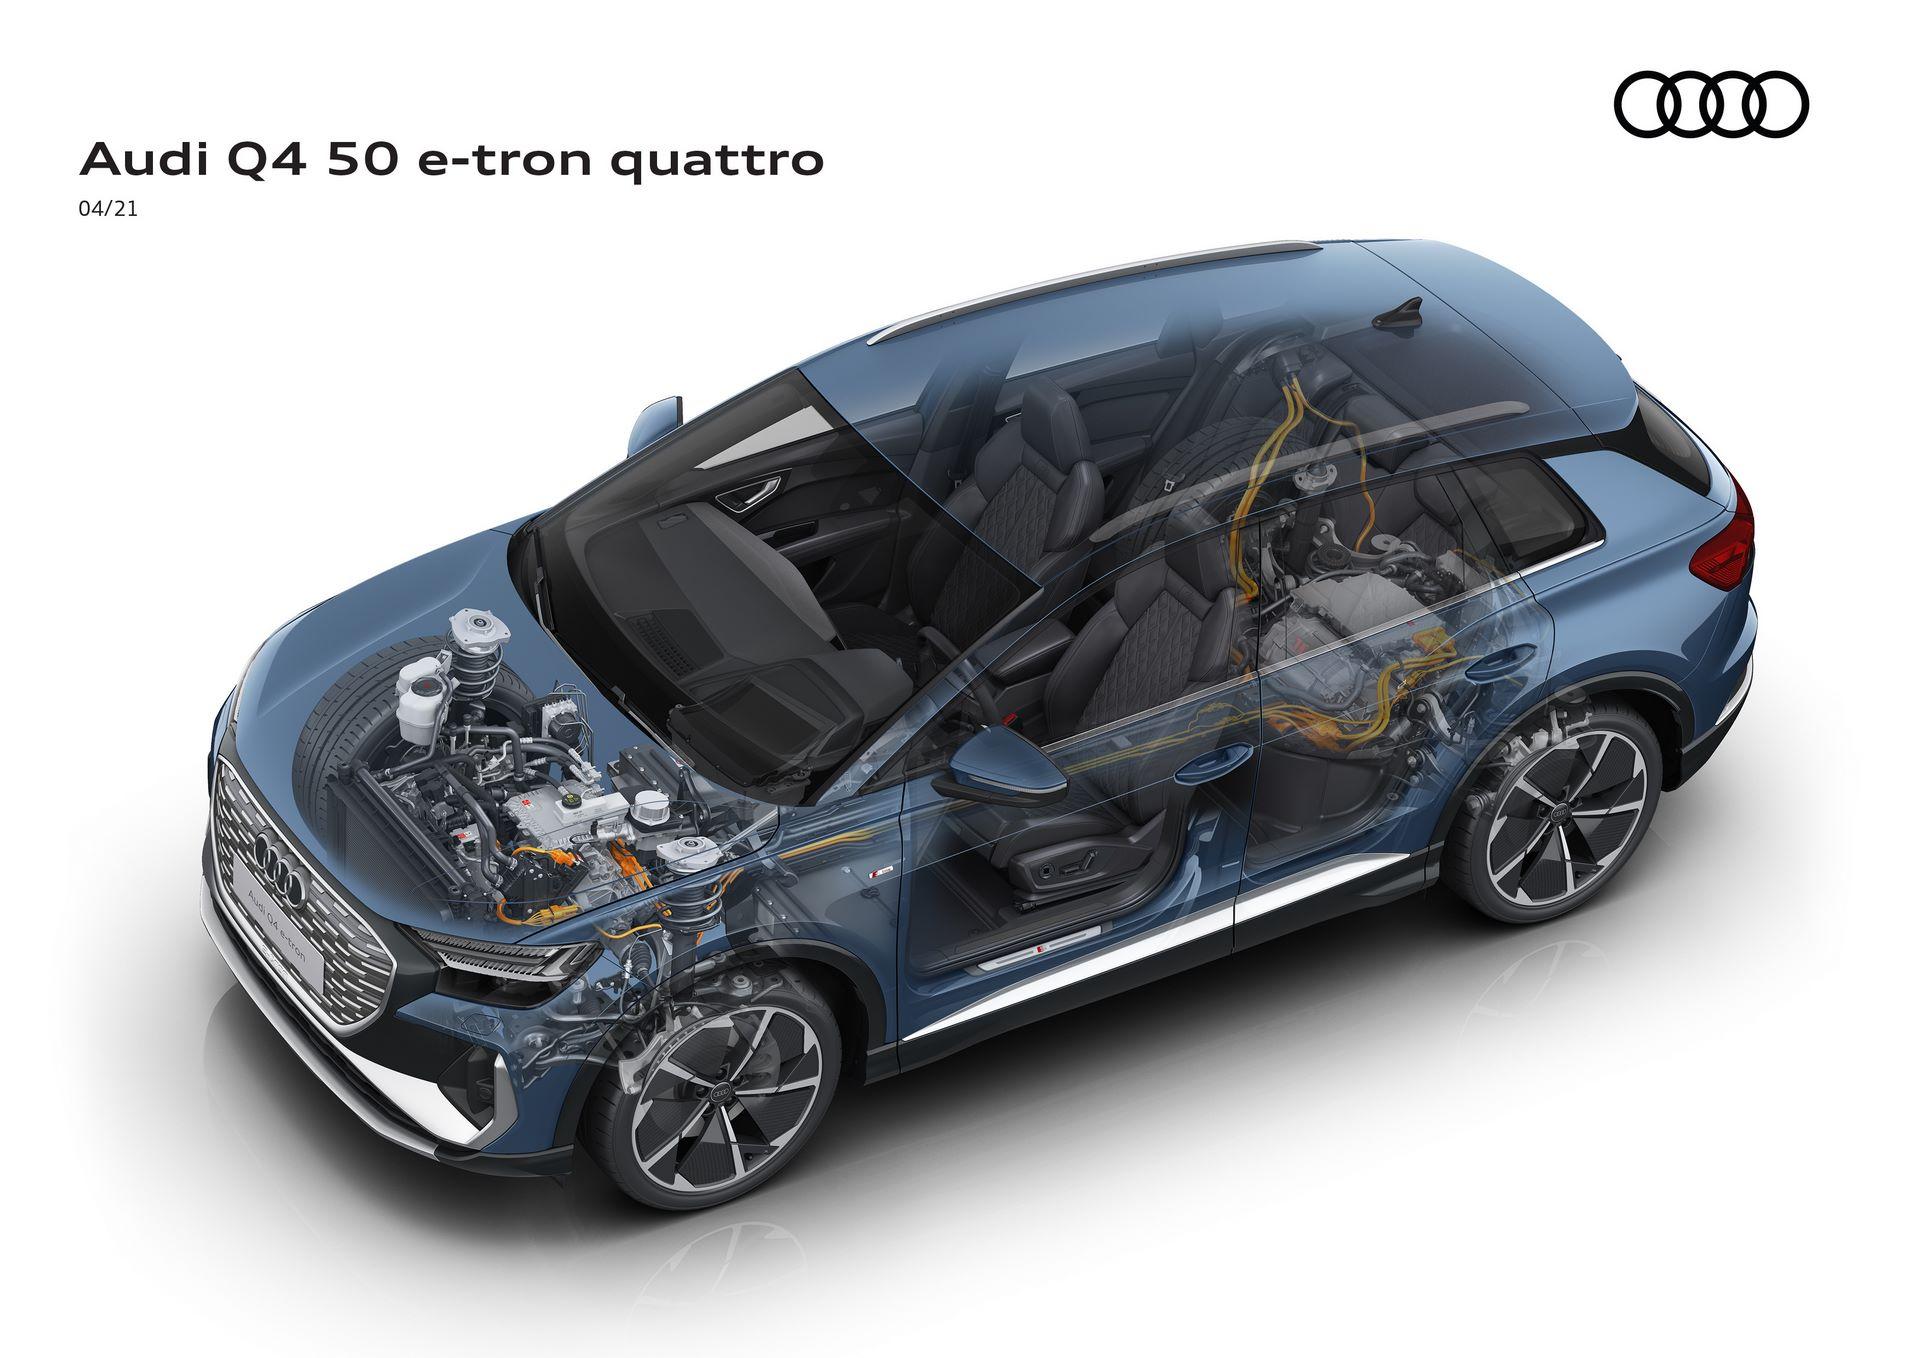 Audi-Q4-e-tron-and-Q4-e-tron-Sportback-120